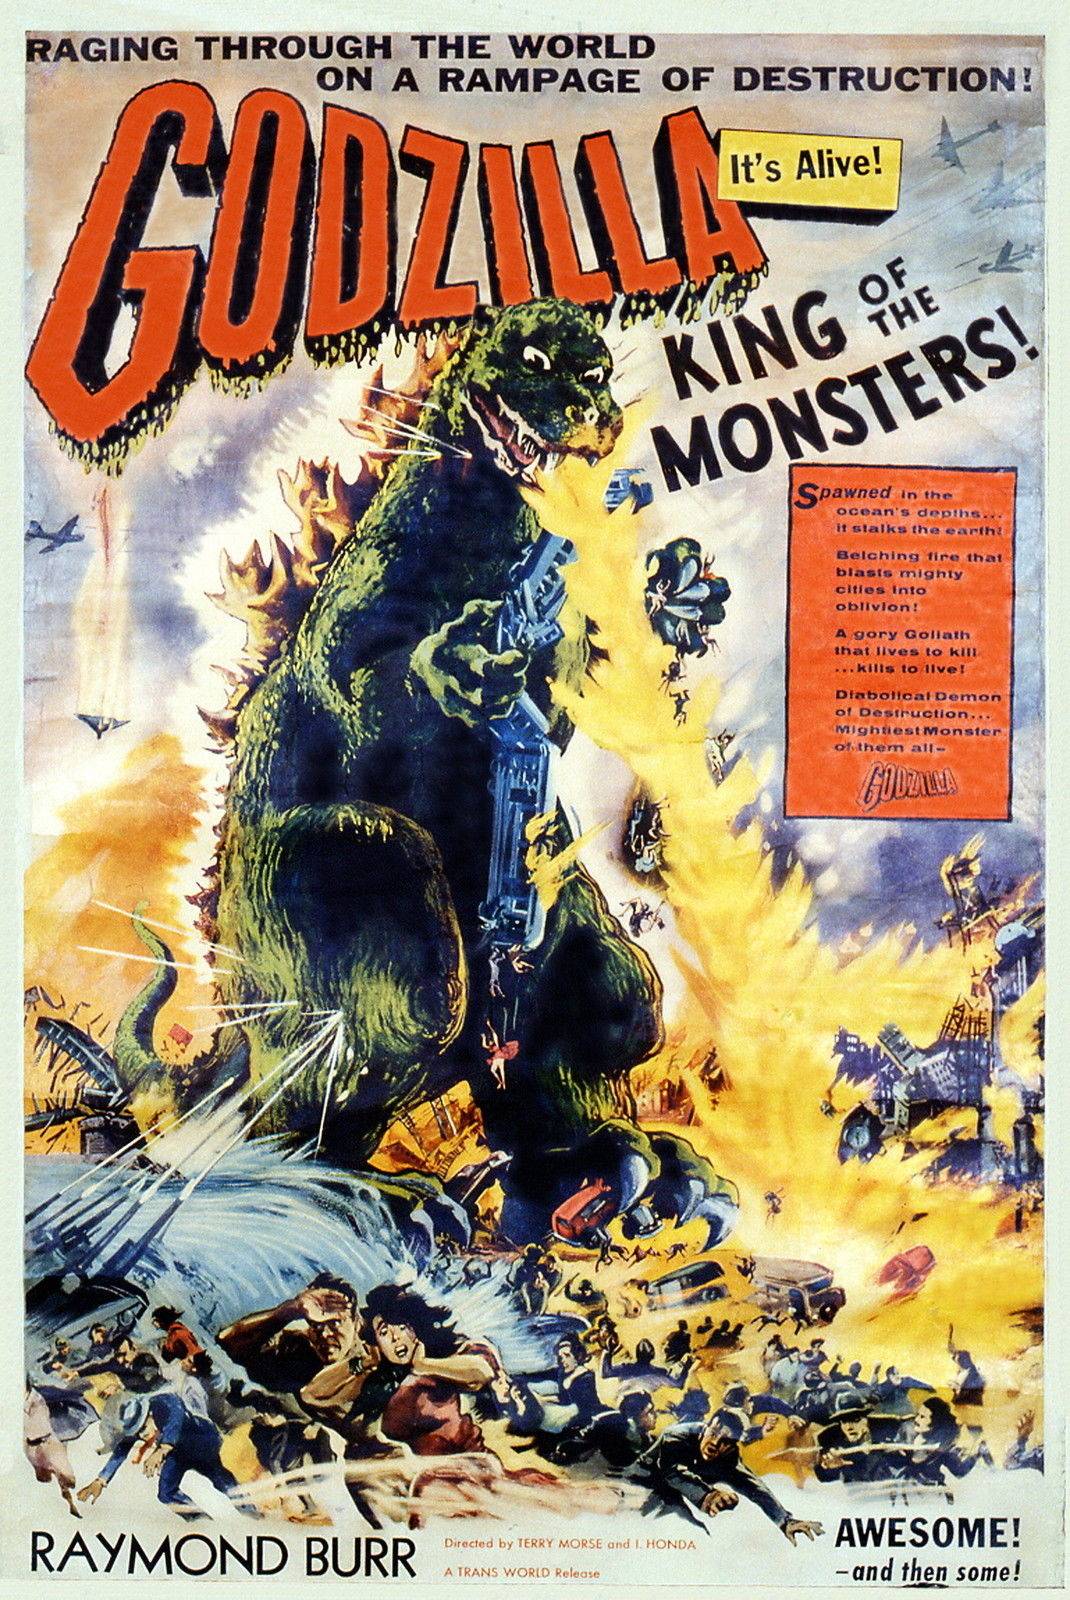 Movie Posters # 32-8 x 10 Tee Shirt Iron On Transfer Godzilla